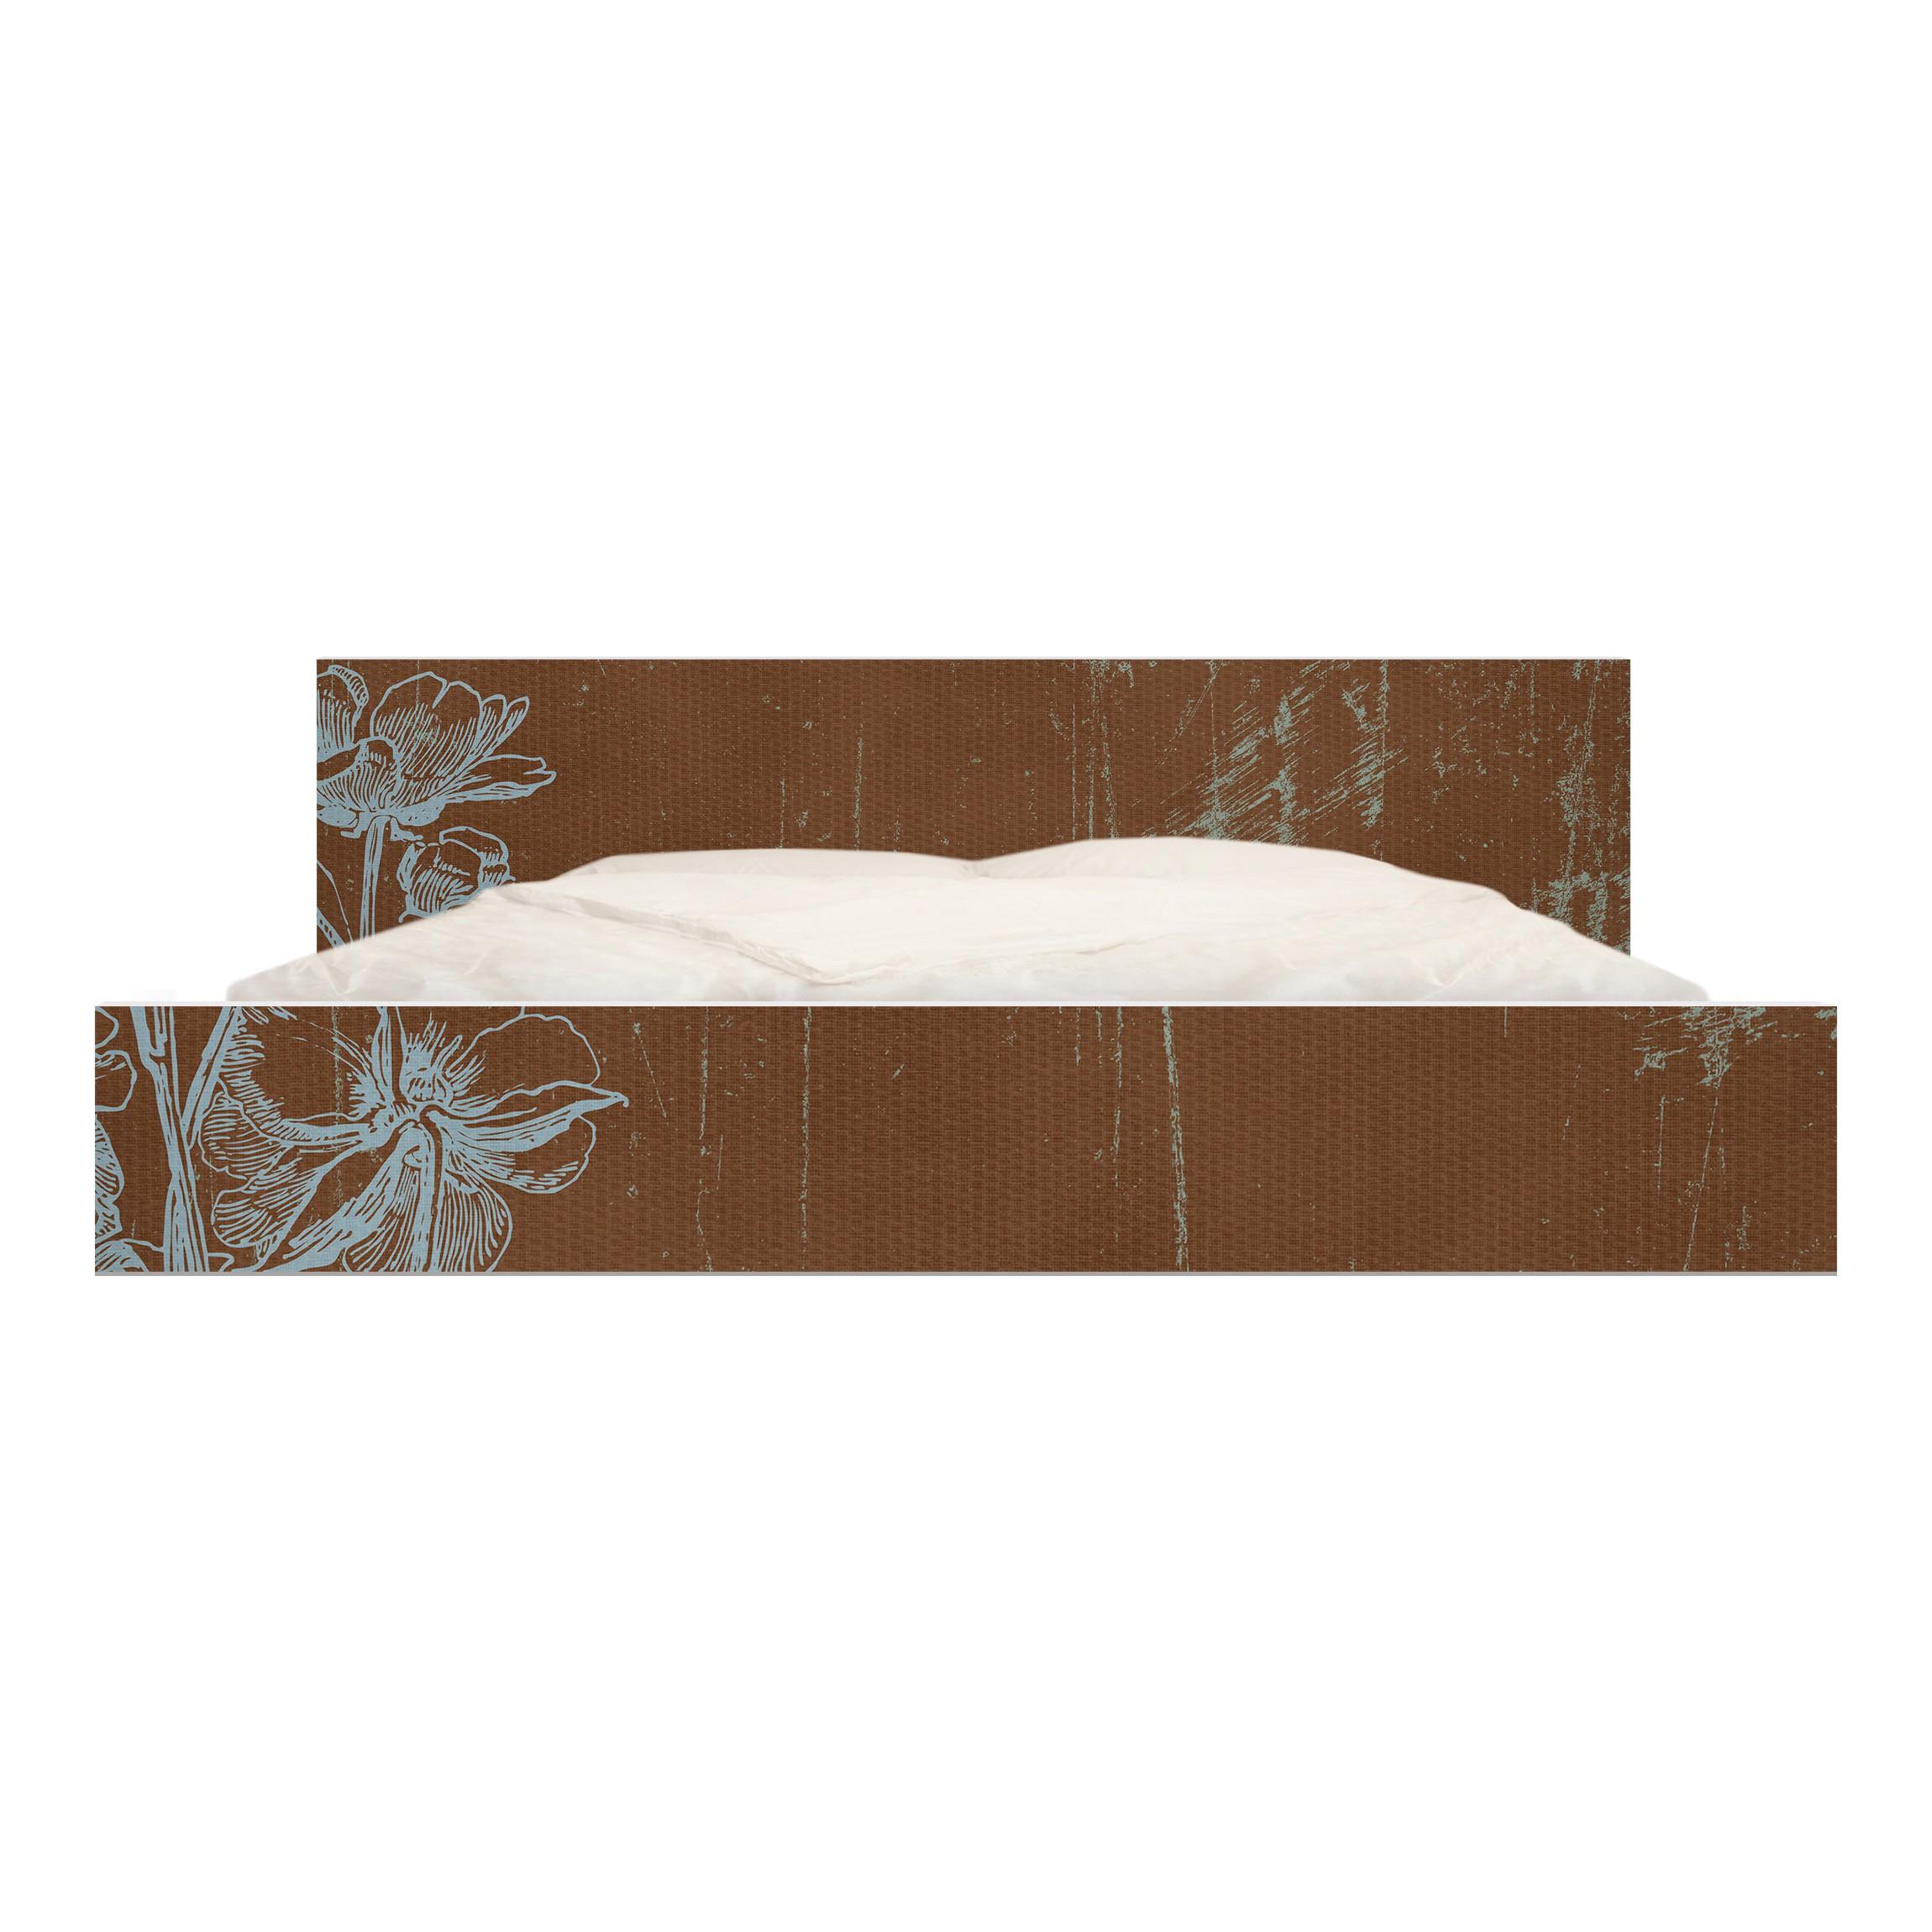 m belfolie f r ikea malm bett niedrig 180x200cm klebefolie blaue blumenskizze. Black Bedroom Furniture Sets. Home Design Ideas